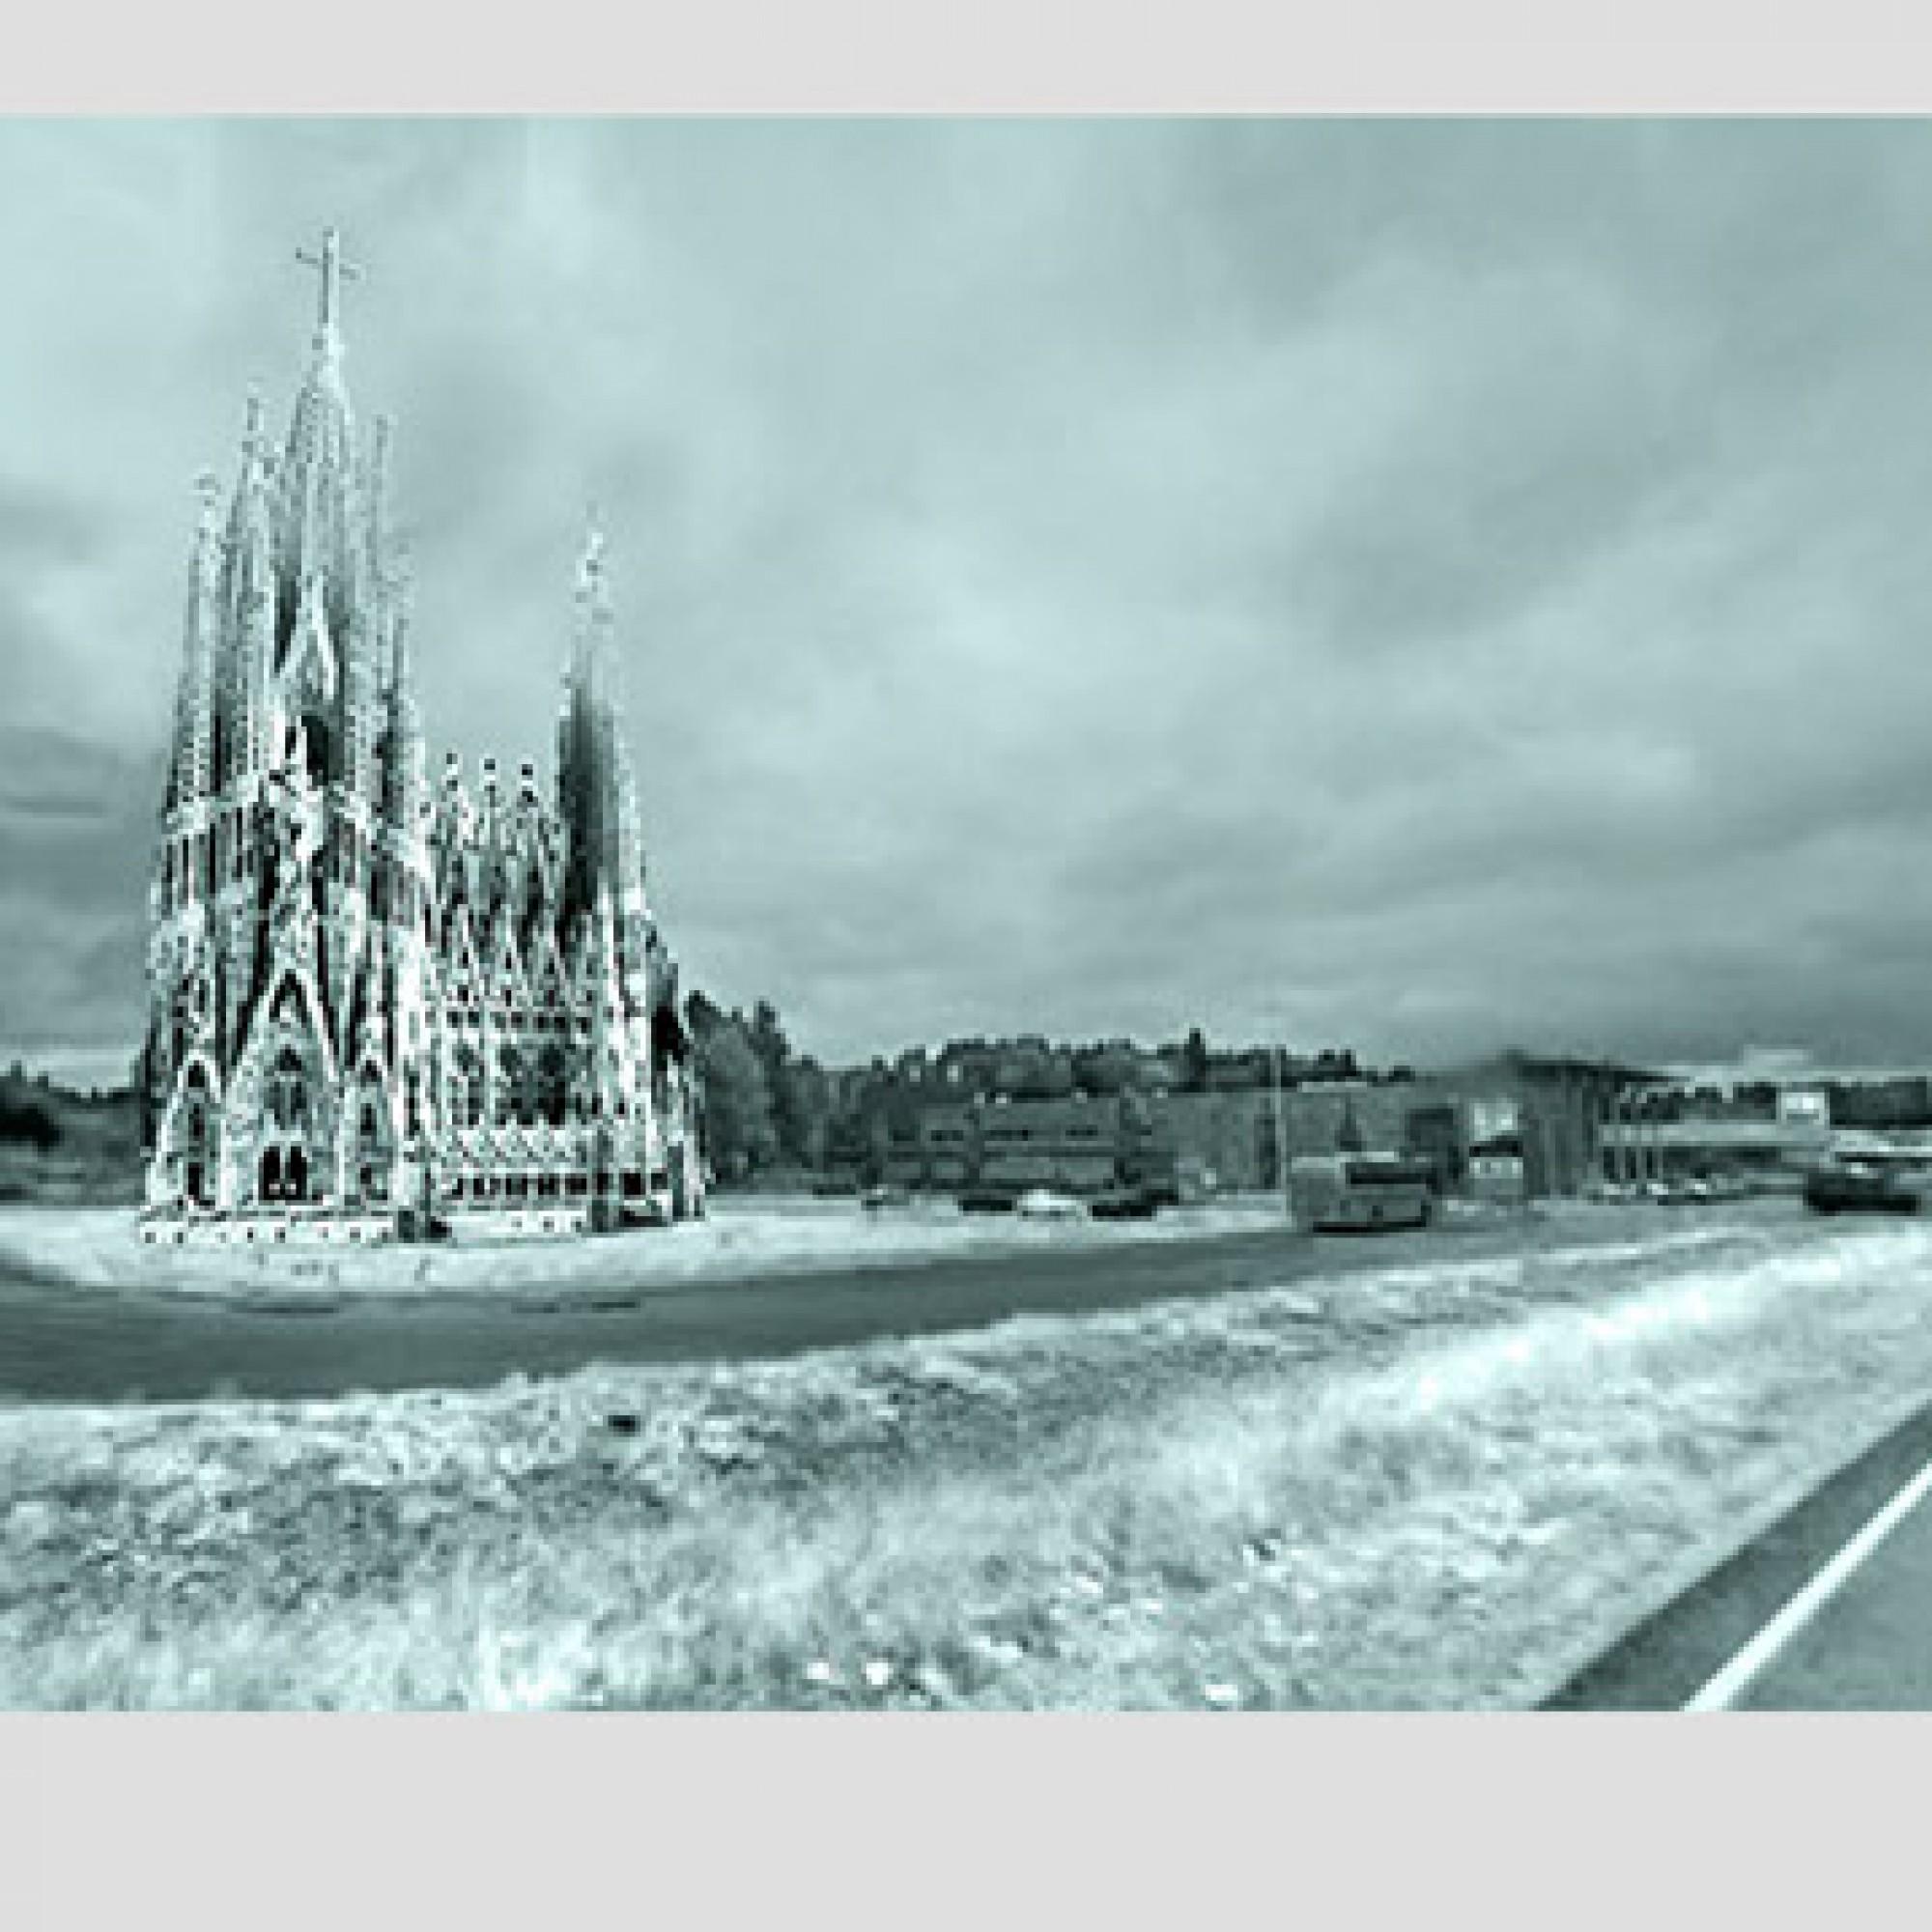 Finnische Sagrada Familia: Soll soll das eisige Bauwerk aussehen. (PD)